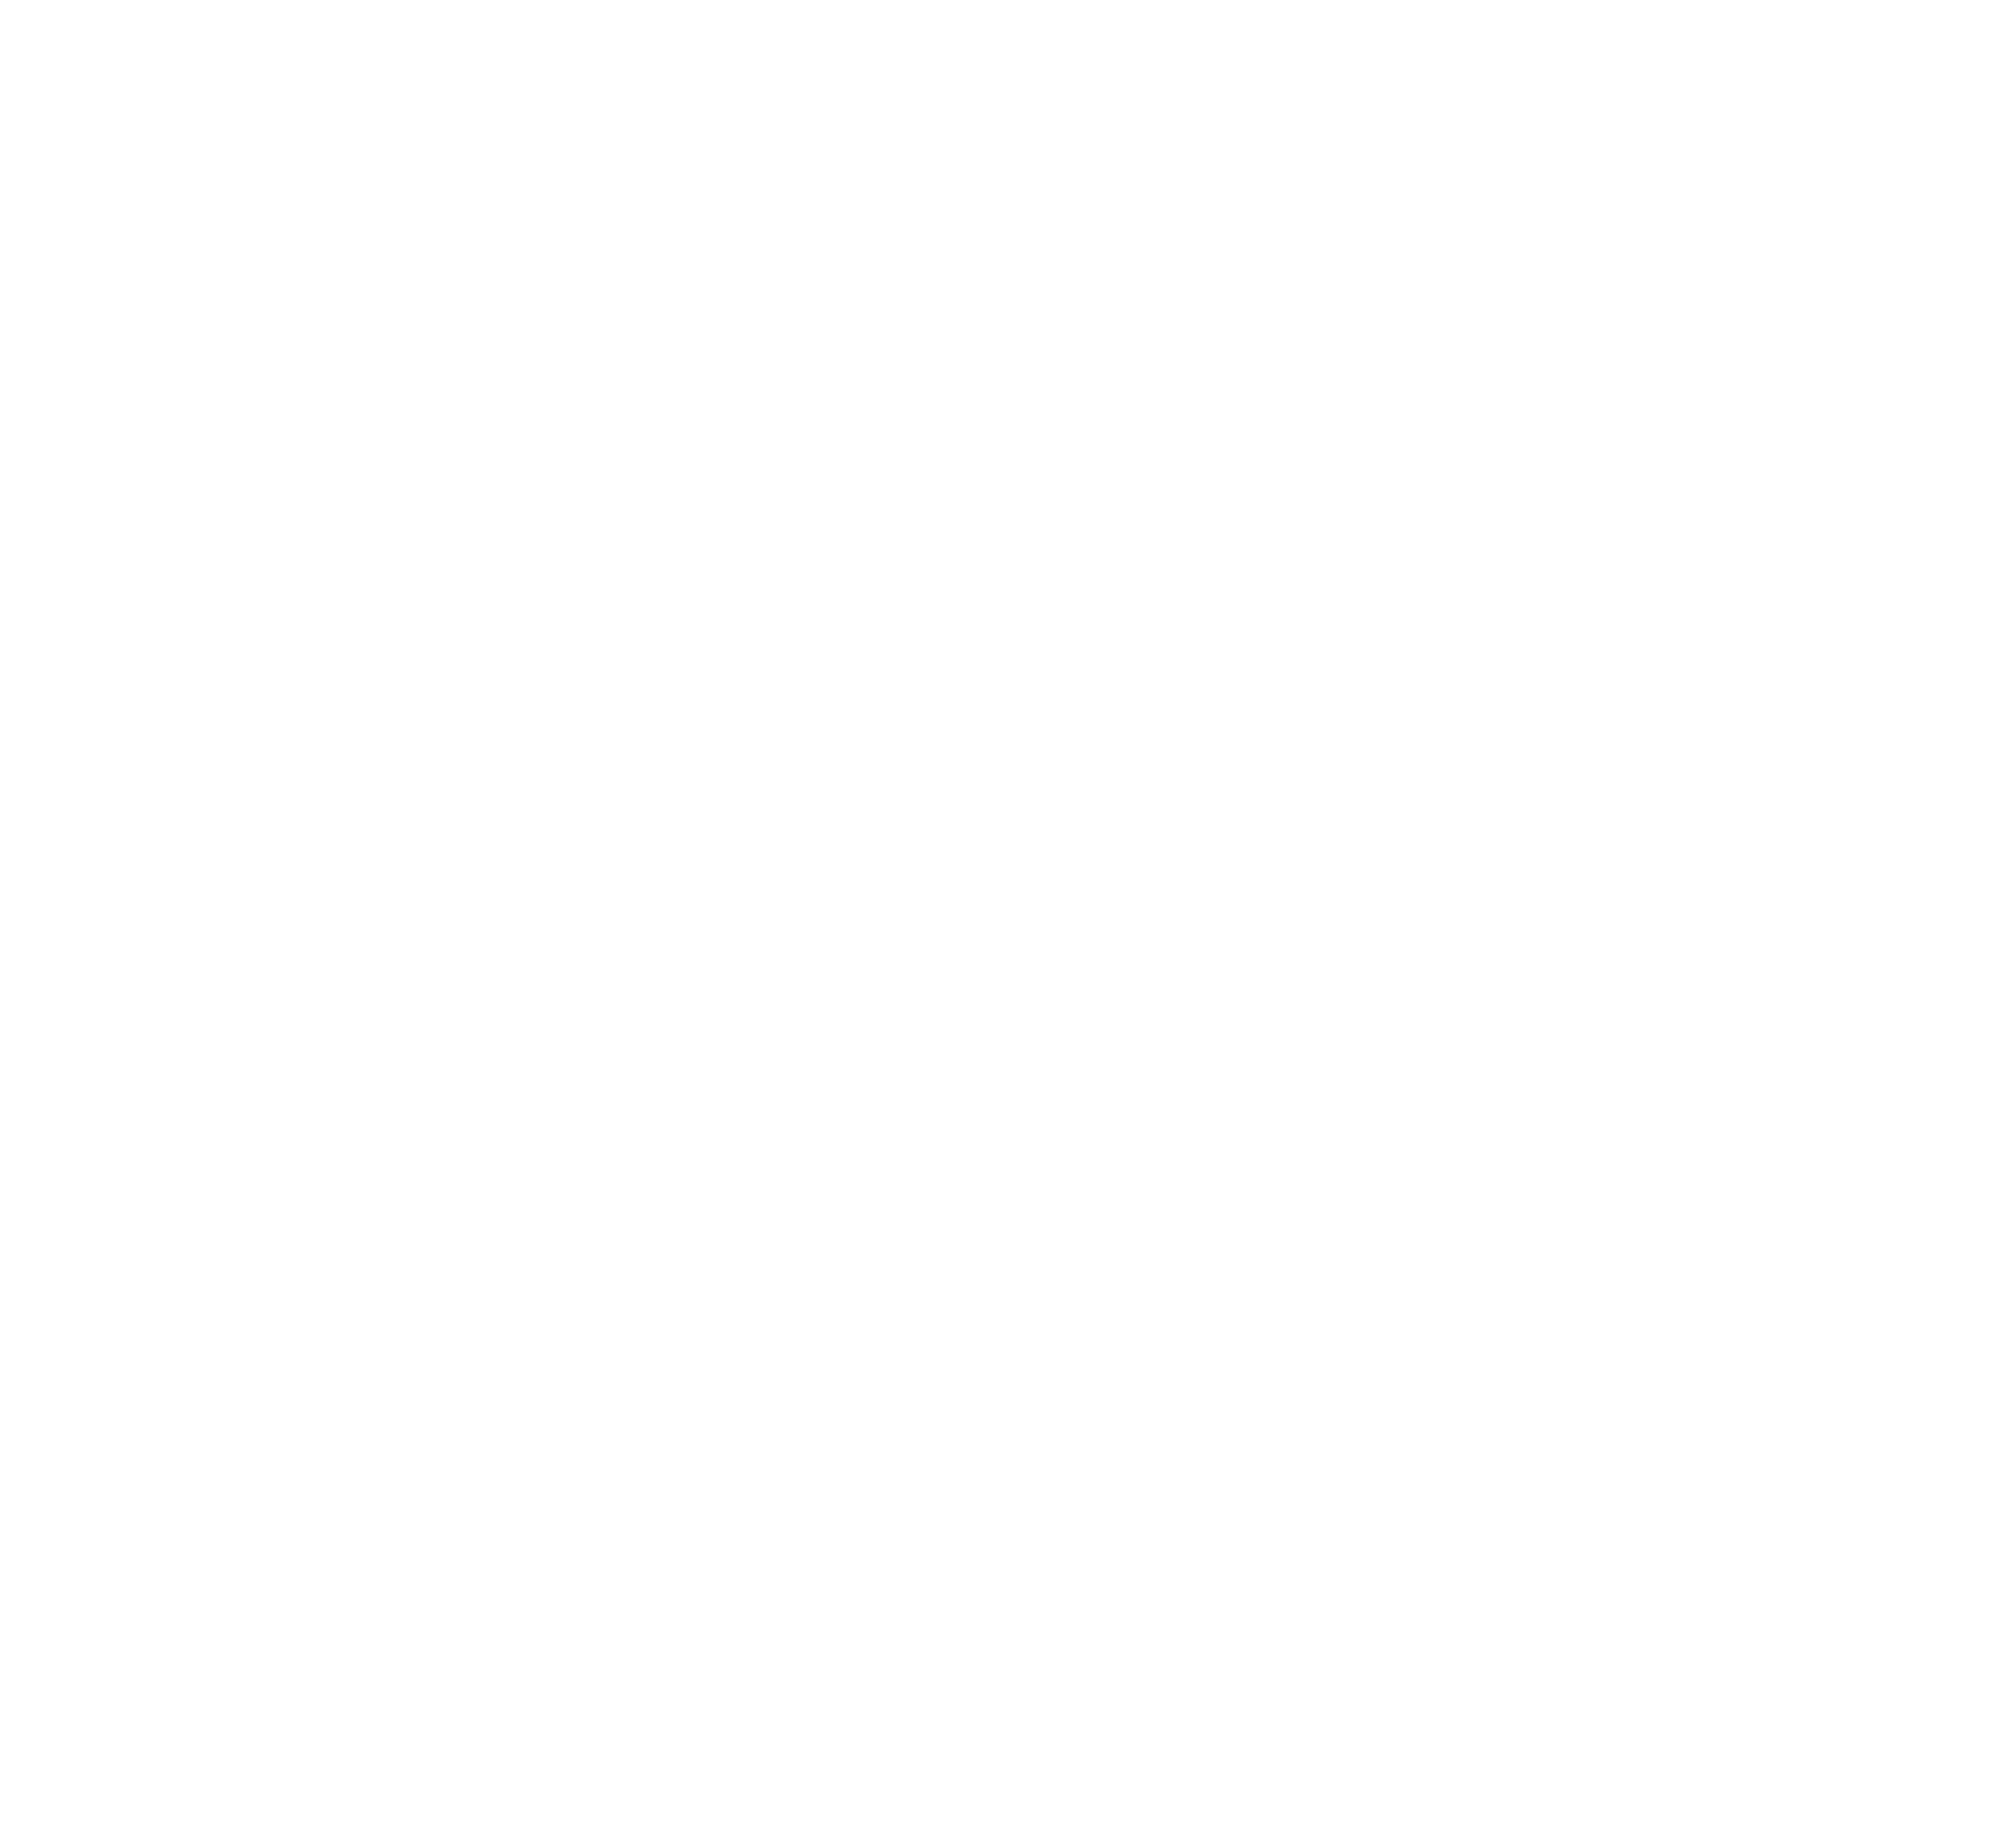 Barred_Owl_Medium_Full_Logo_Transparent_BG.png